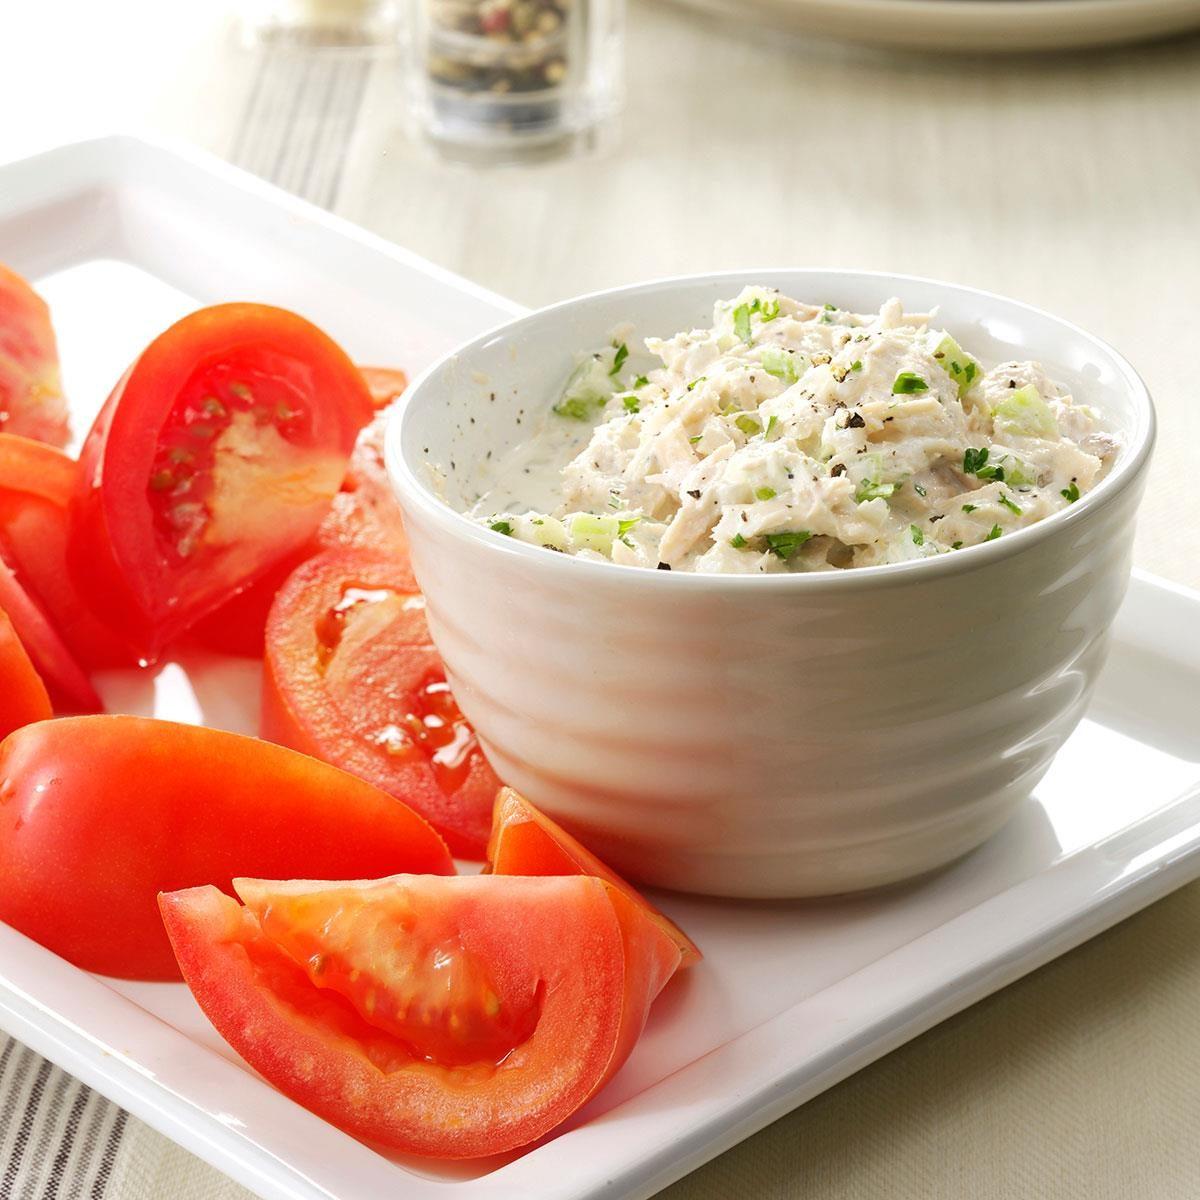 How to Make a Healthy Tuna Salad Recipe